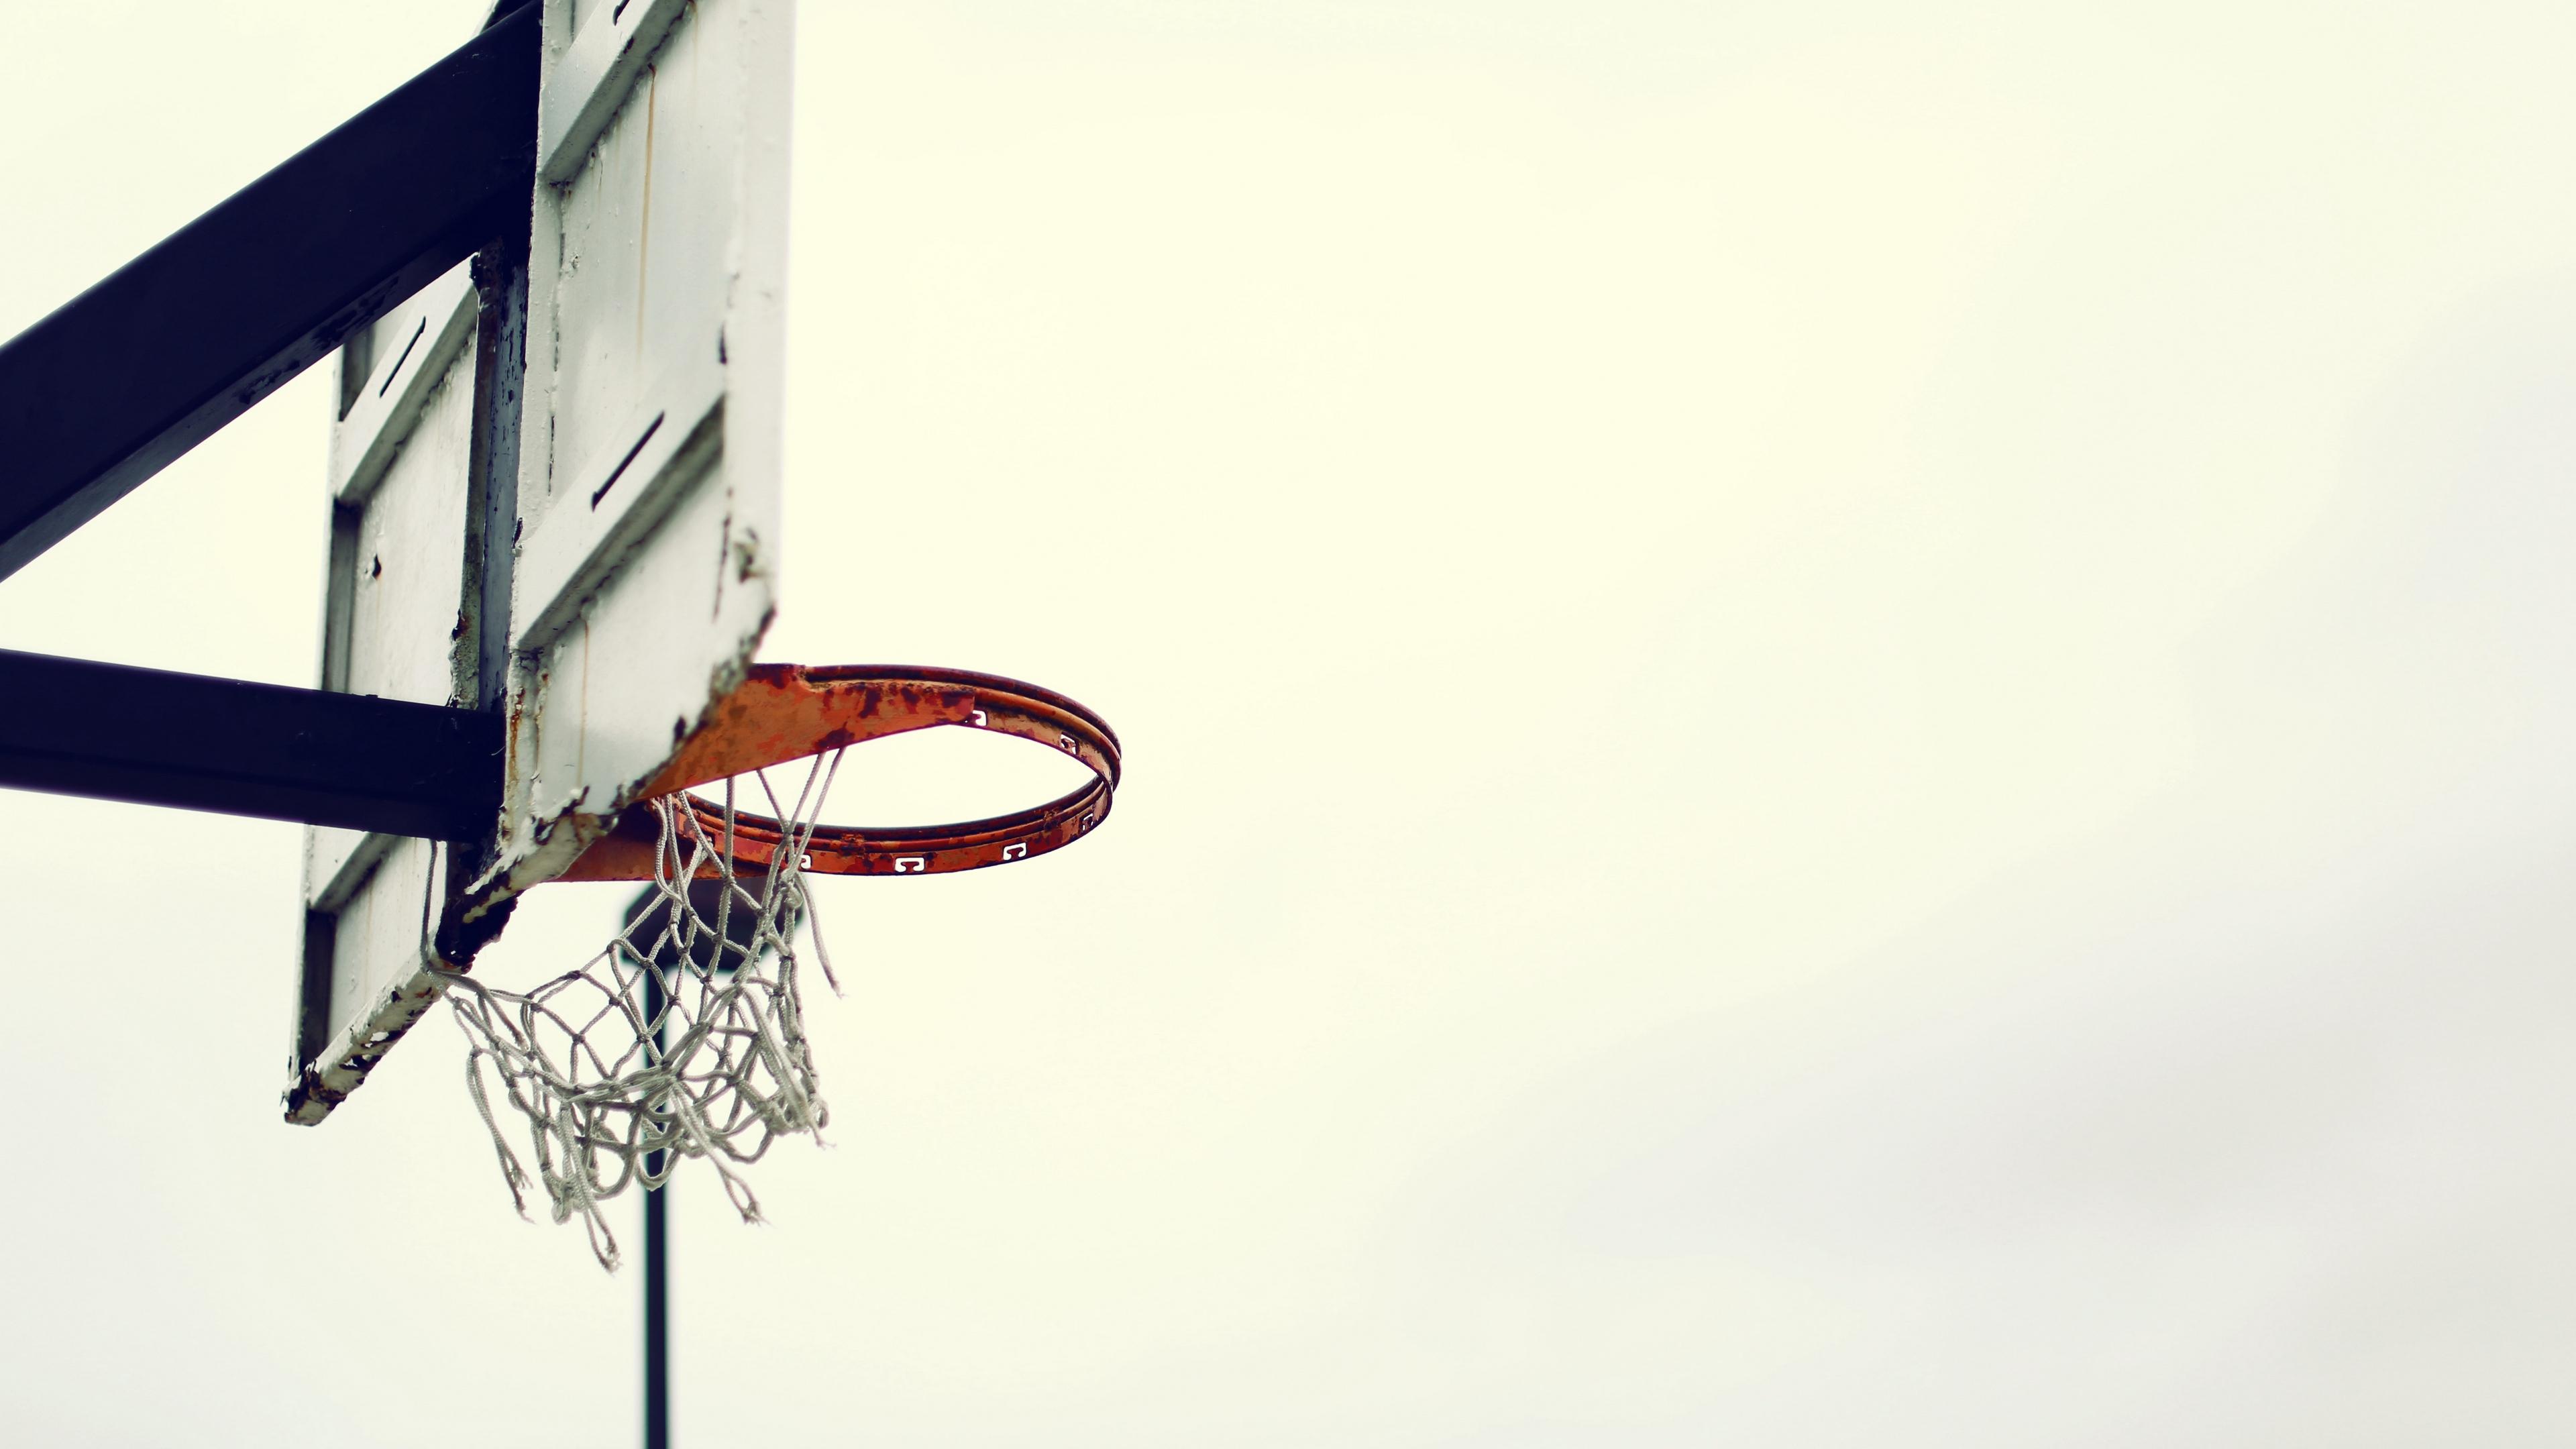 basketball board basketball net old 4k 1540062608 - basketball board, basketball net, old 4k - Old, basketball net, basketball board